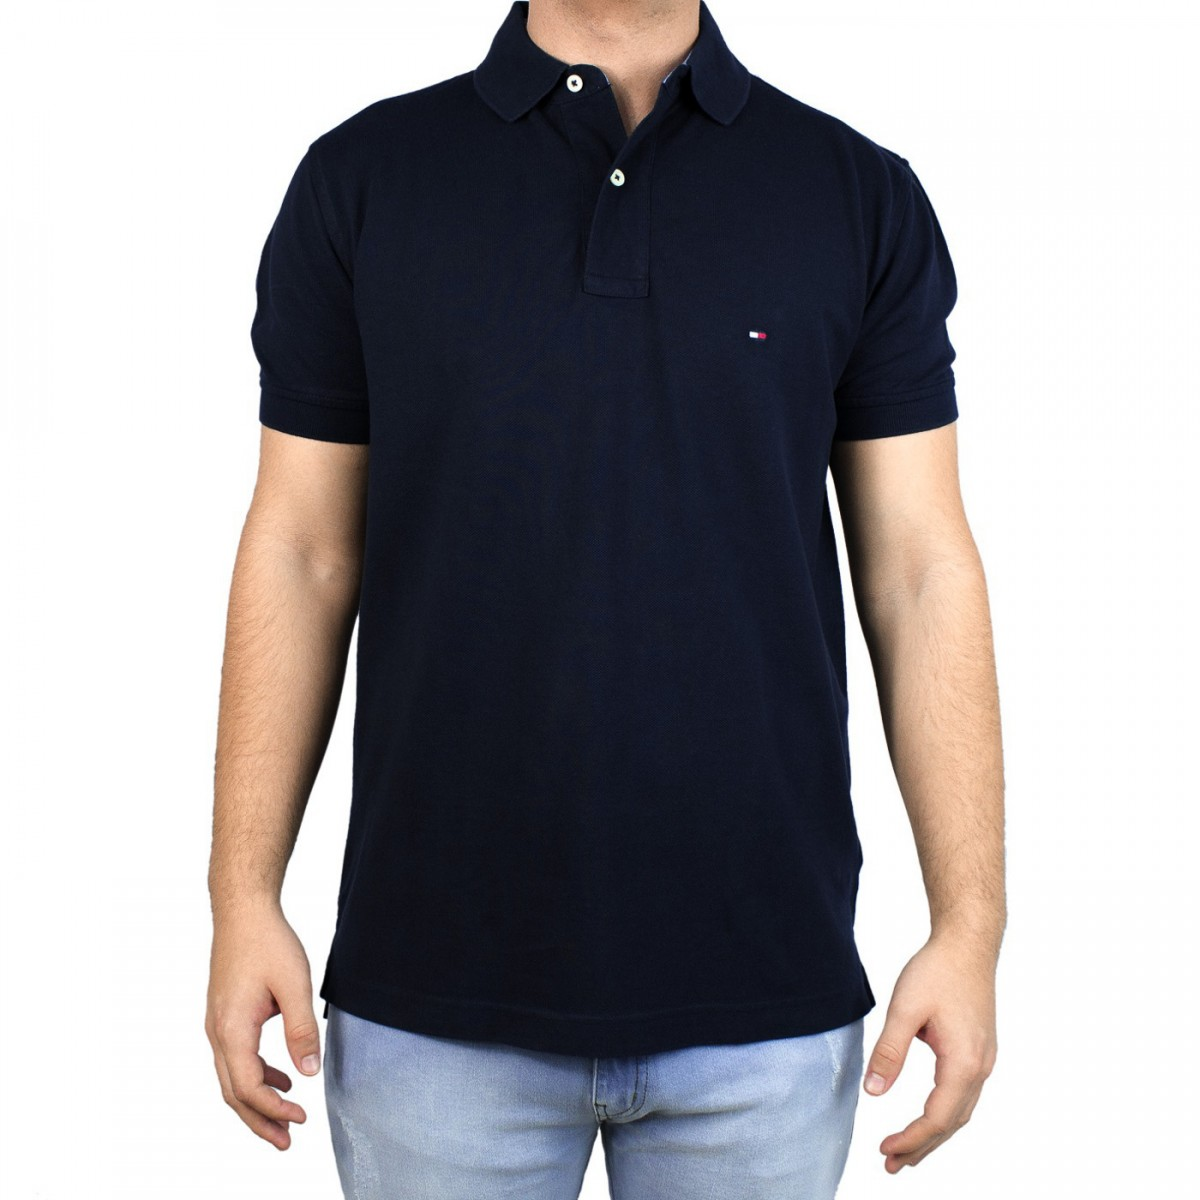 Bizz Store - Camisa Polo Masculina Tommy Hilfiger Manga Curta e90fc0a24dd6e